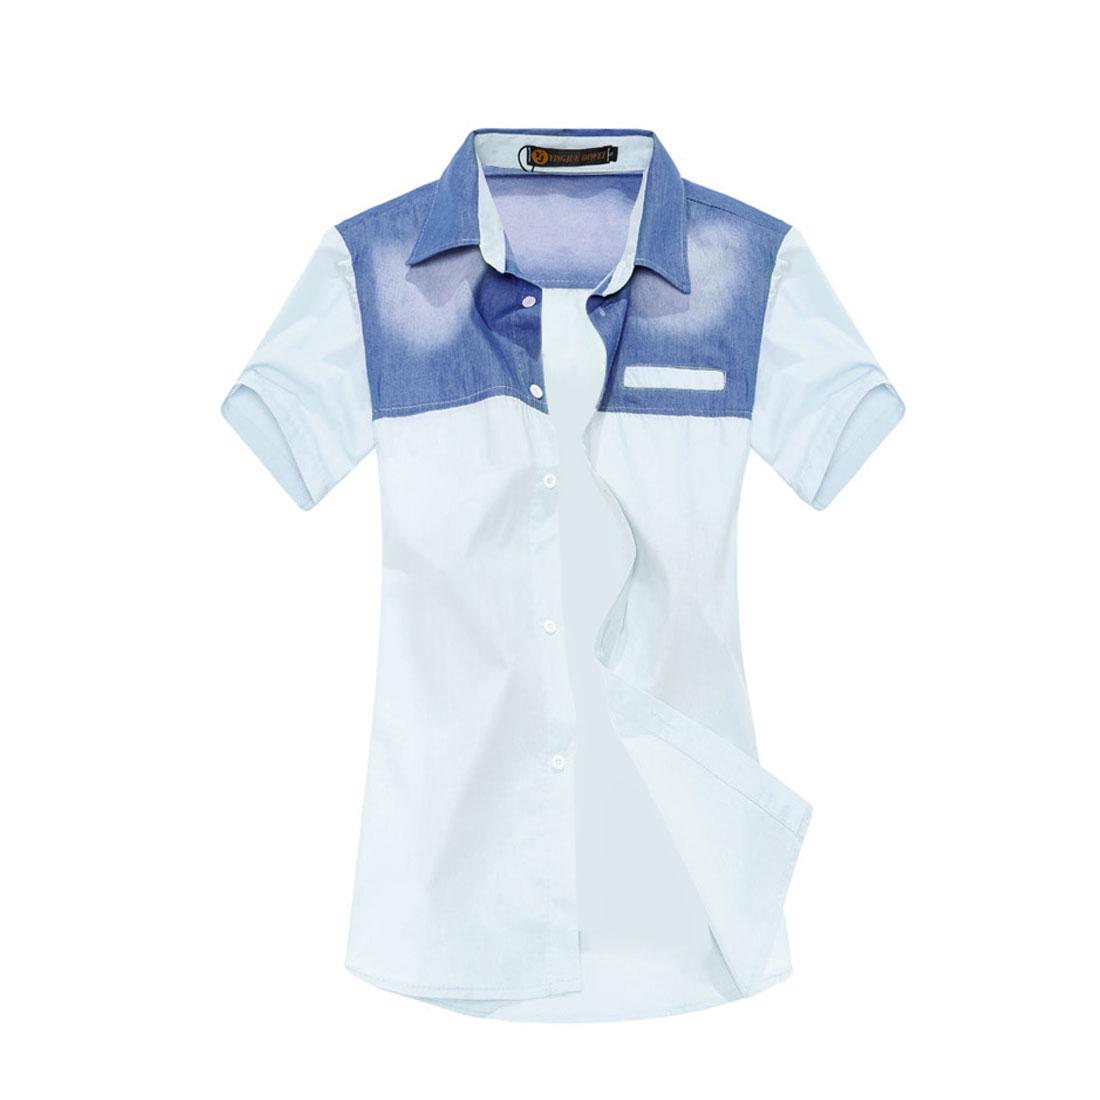 Mens Chic Point Collar Short Sleeve Denim Splice Light Blue Casual Shirt M